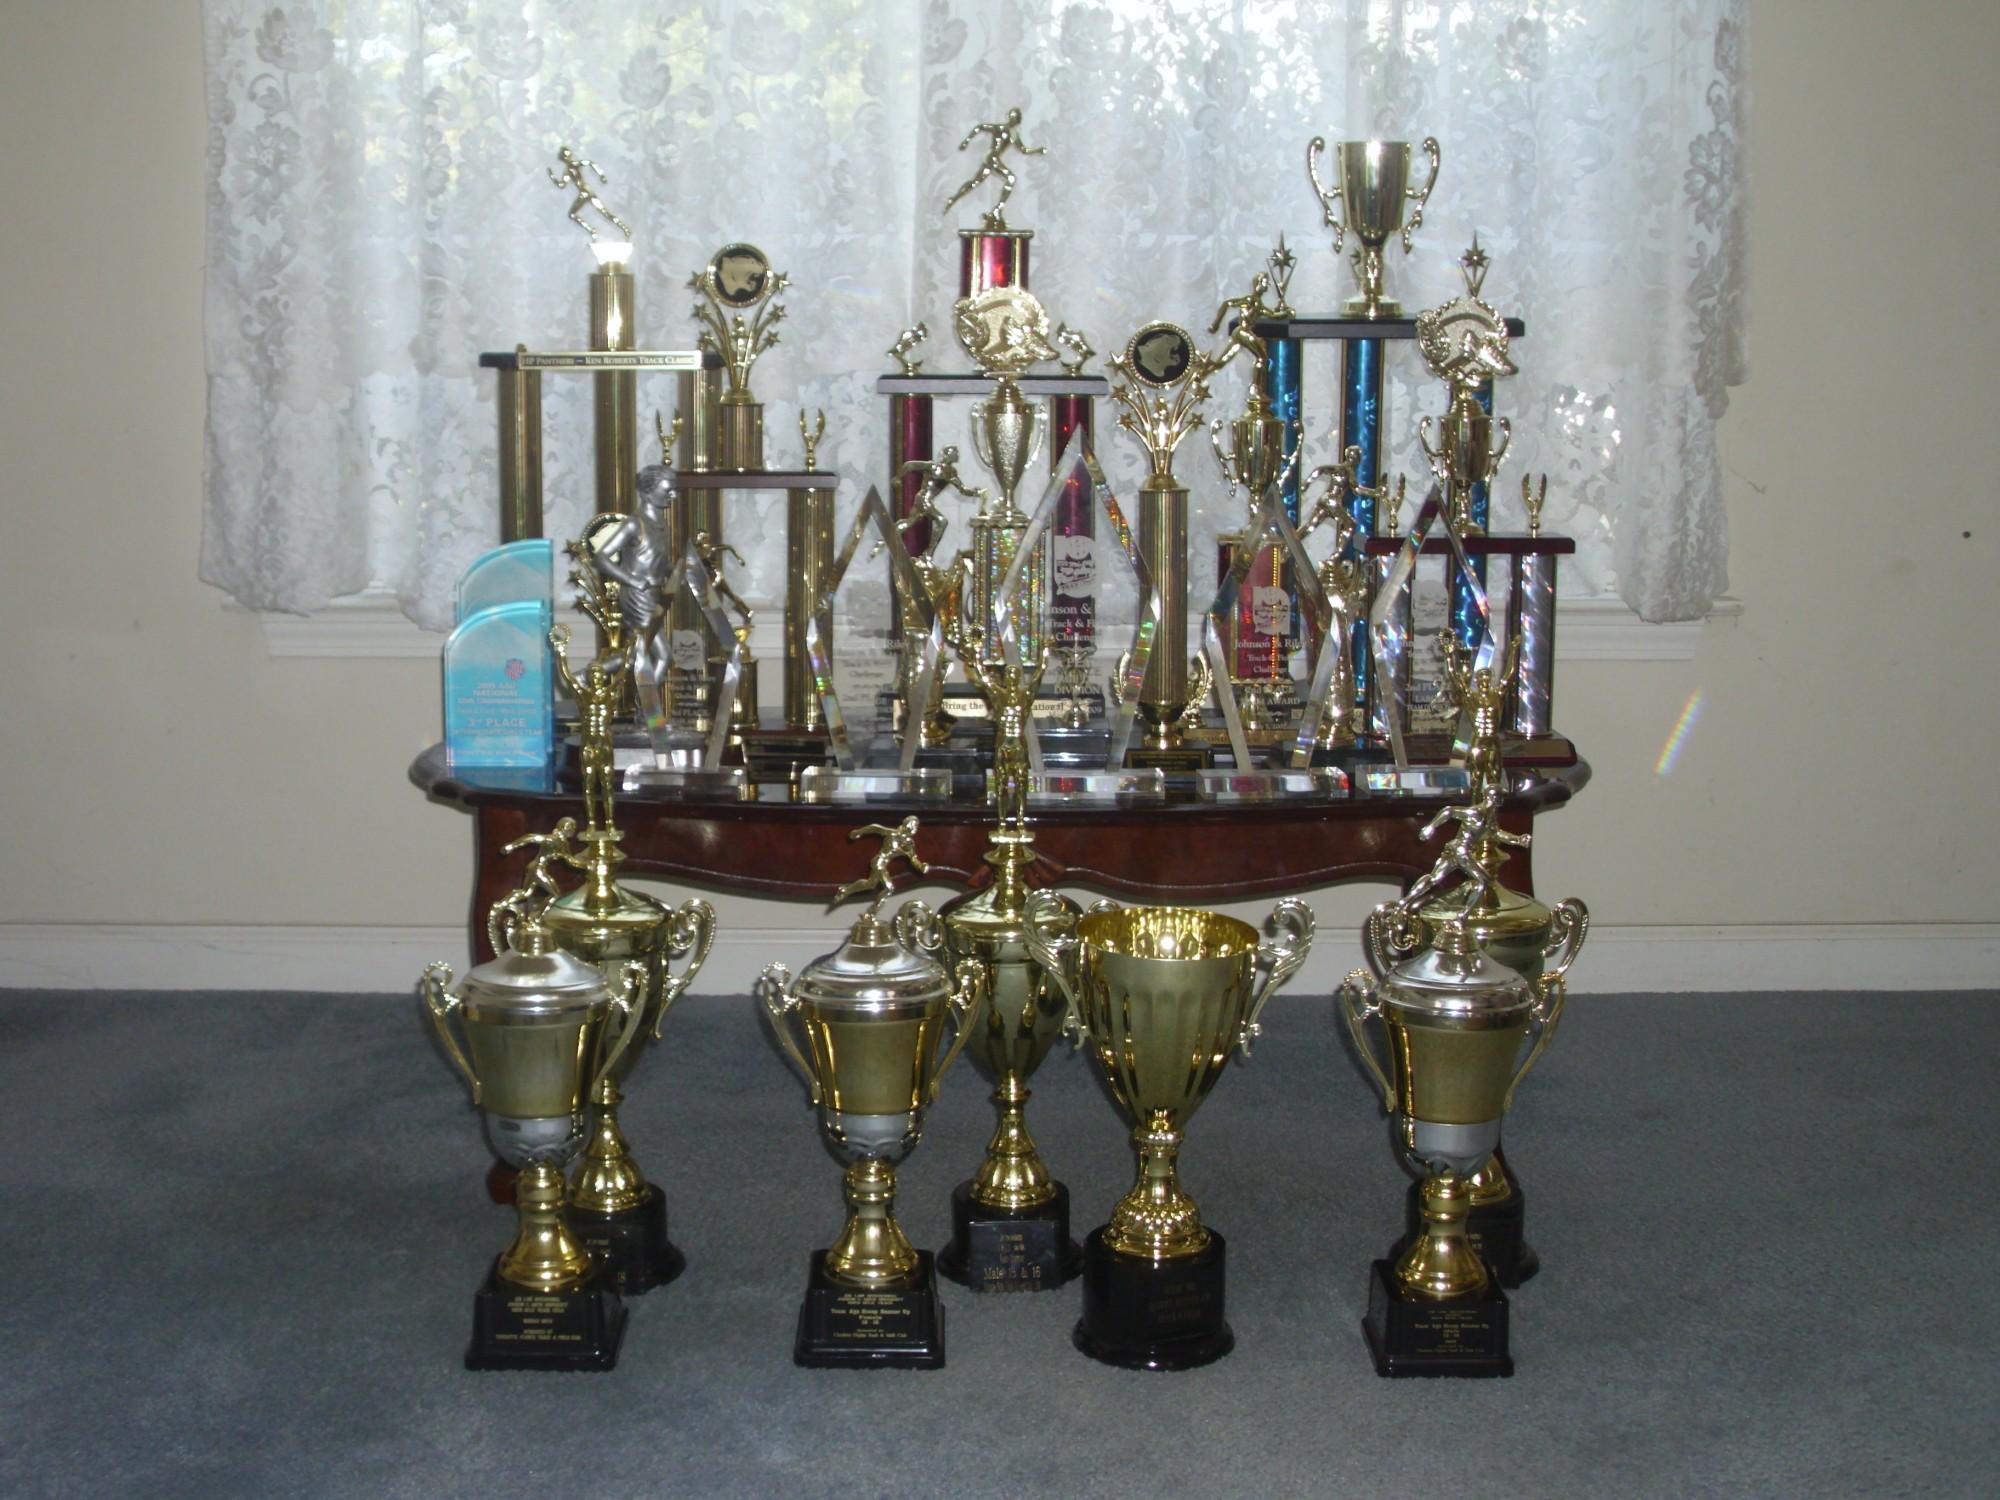 2011 NC (AAU) Region 5 Champions